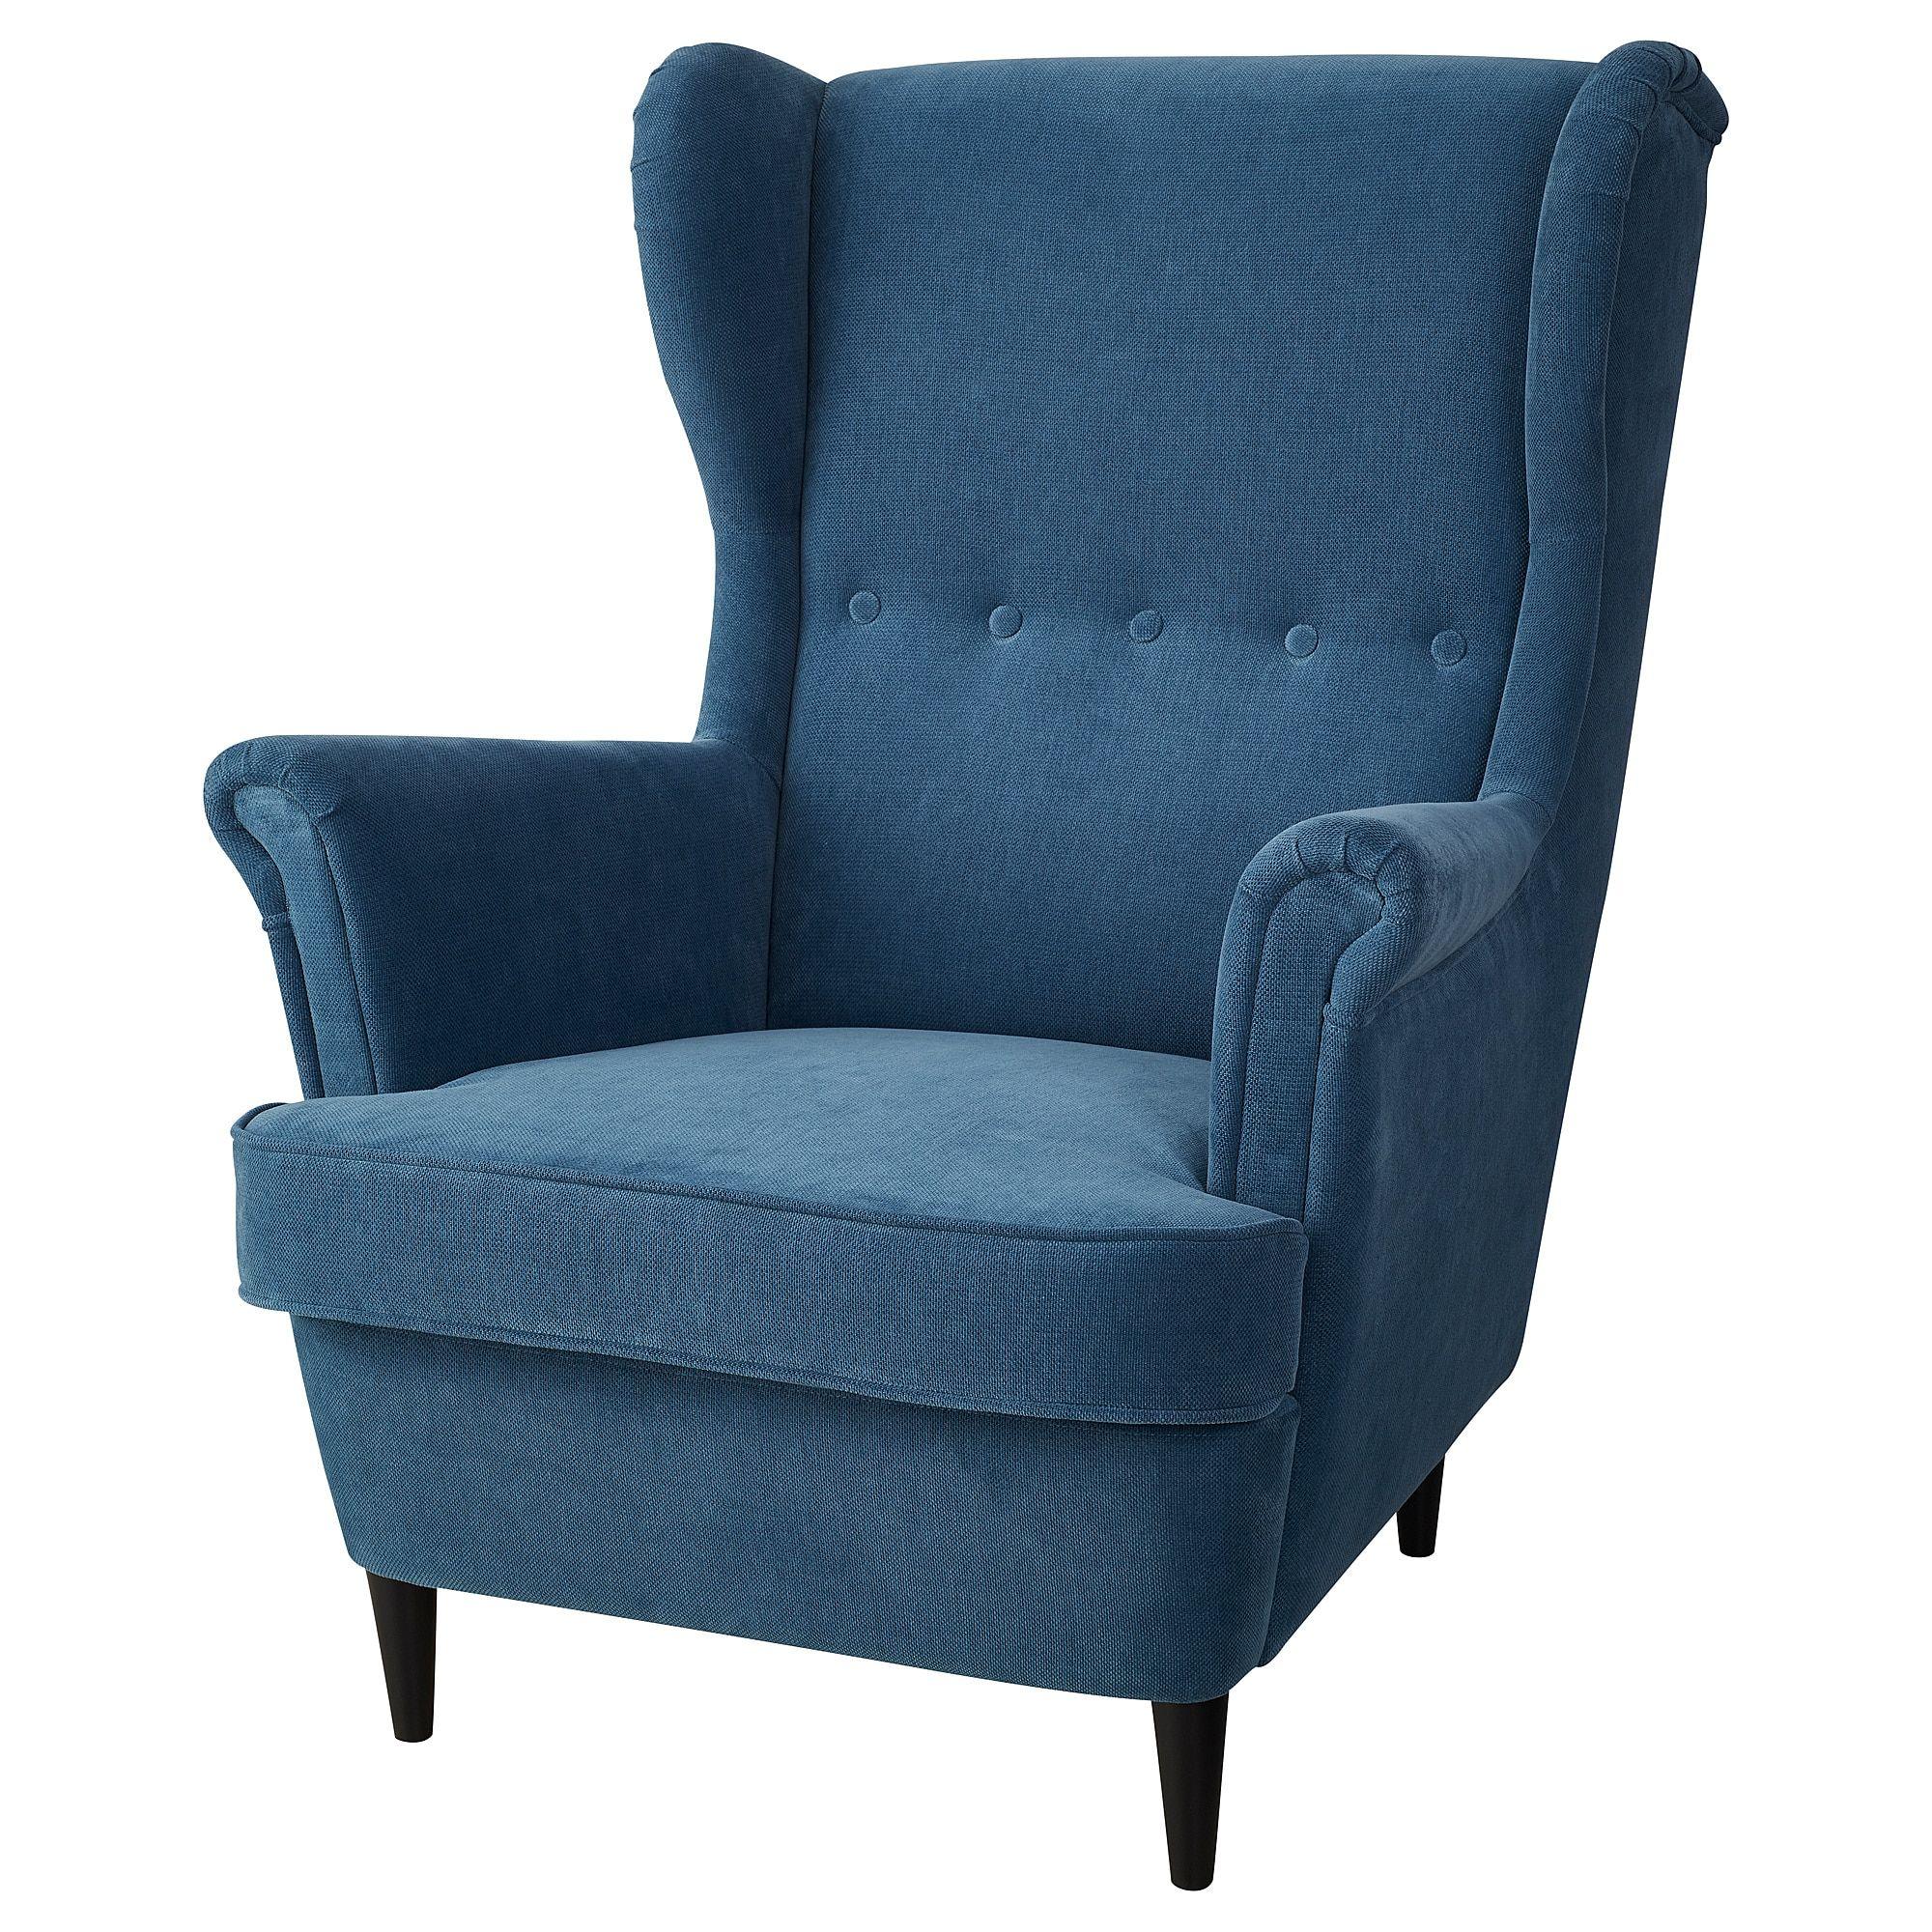 STRANDMON Wing chair Tallmyra turquoise blue Ikea